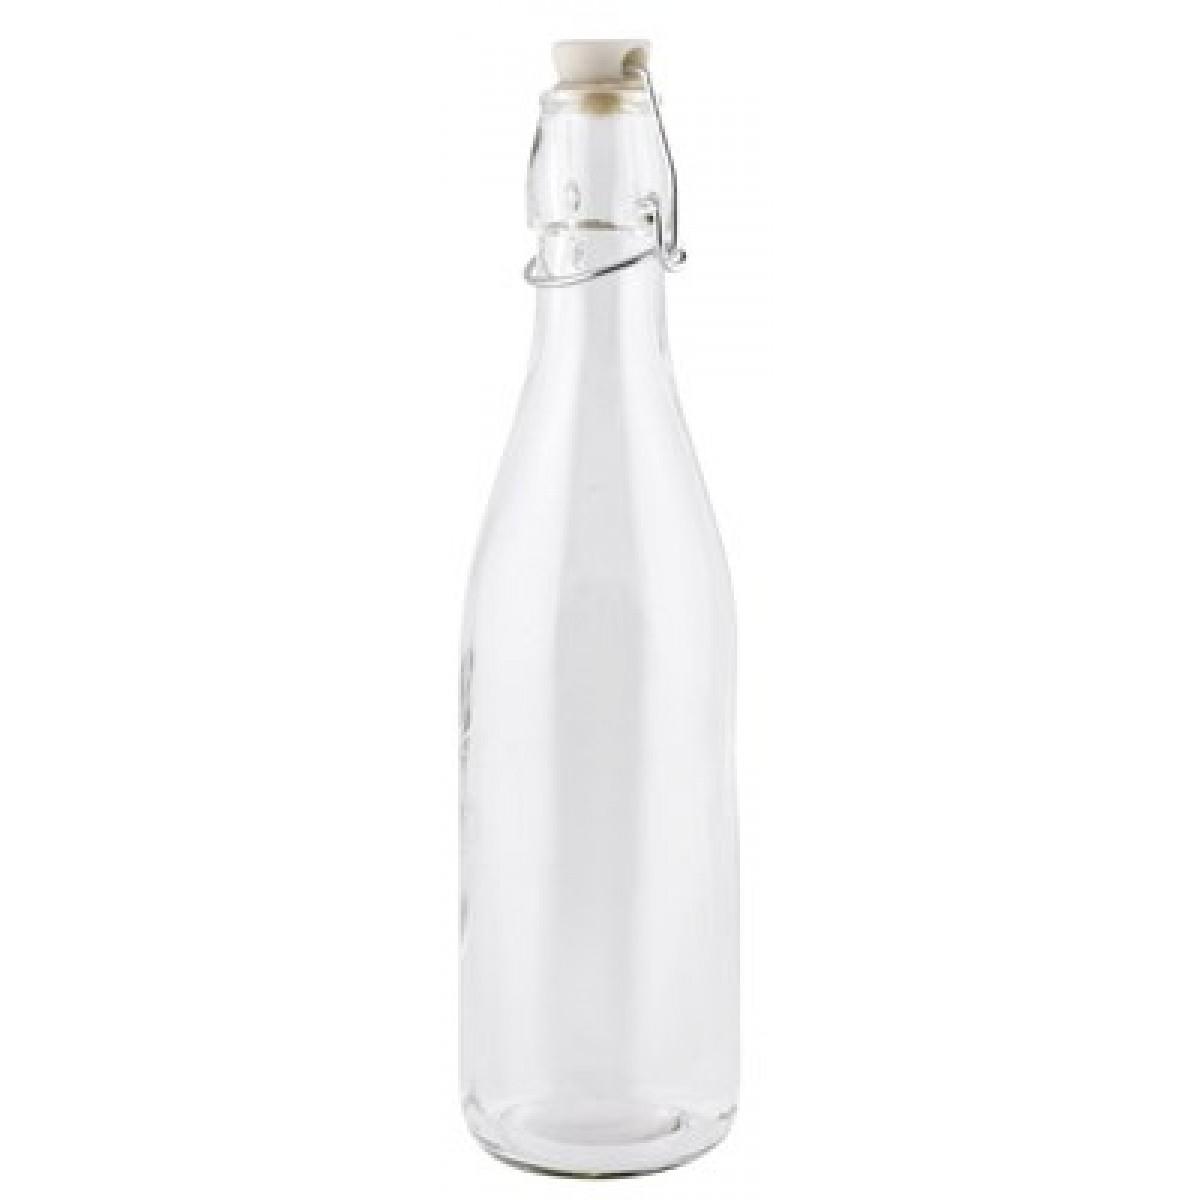 DAY Saftflaske 0,5 L m/patentprop